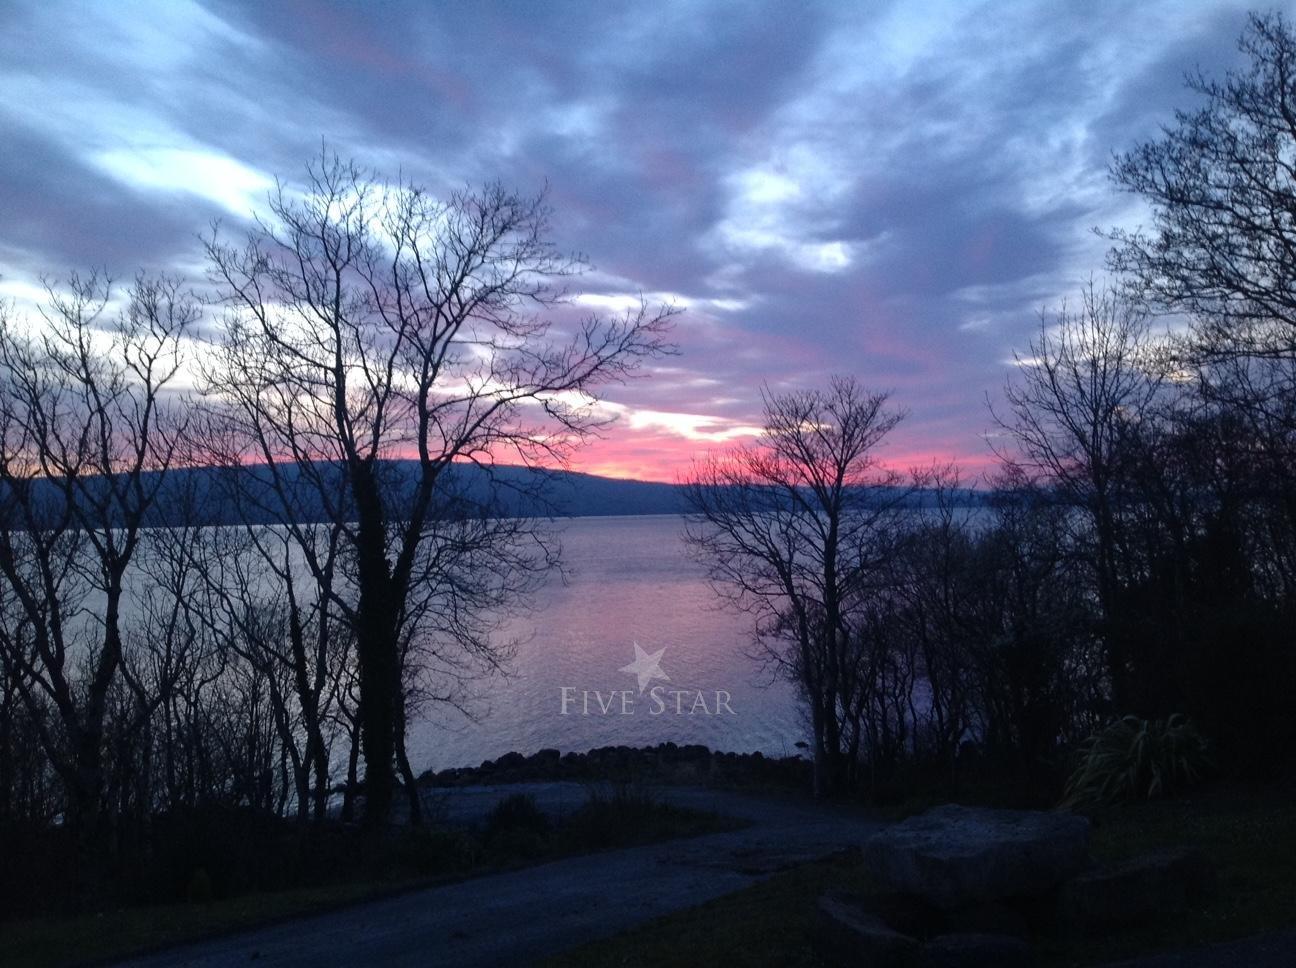 Ceo na Locha photo 23